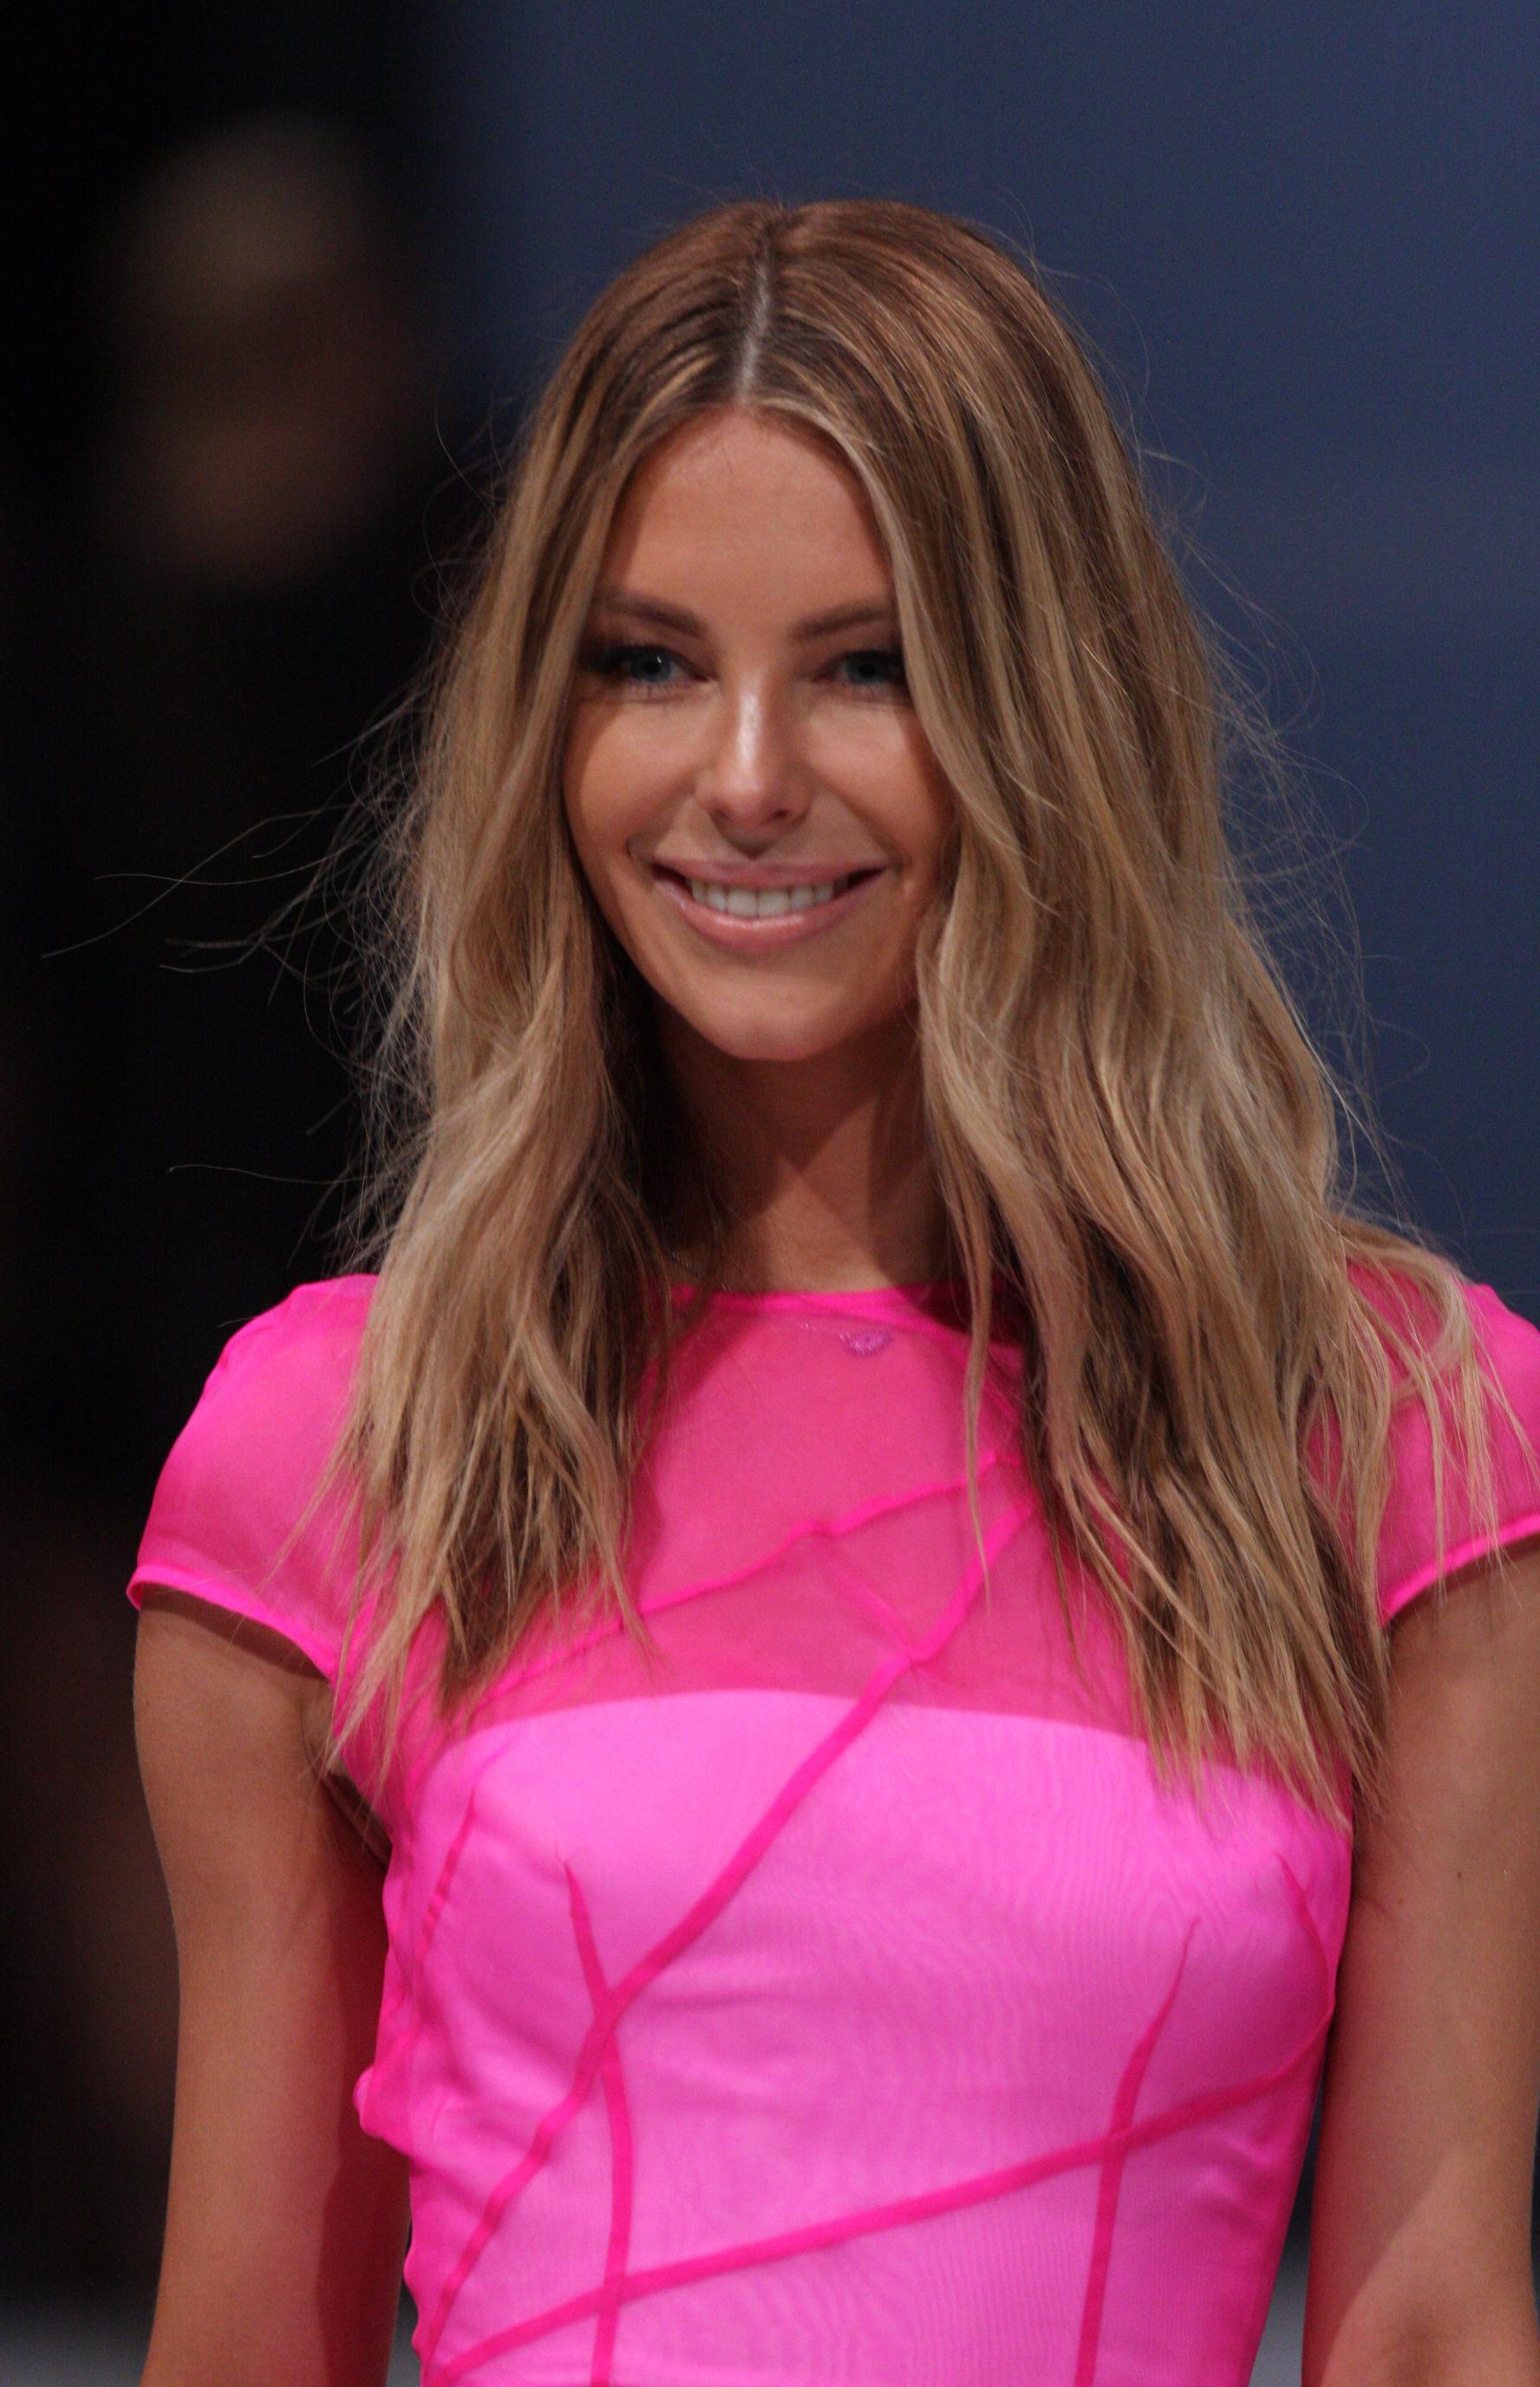 Photo of Jennifer Hawkins: Australian beauty queen, model and television presenter